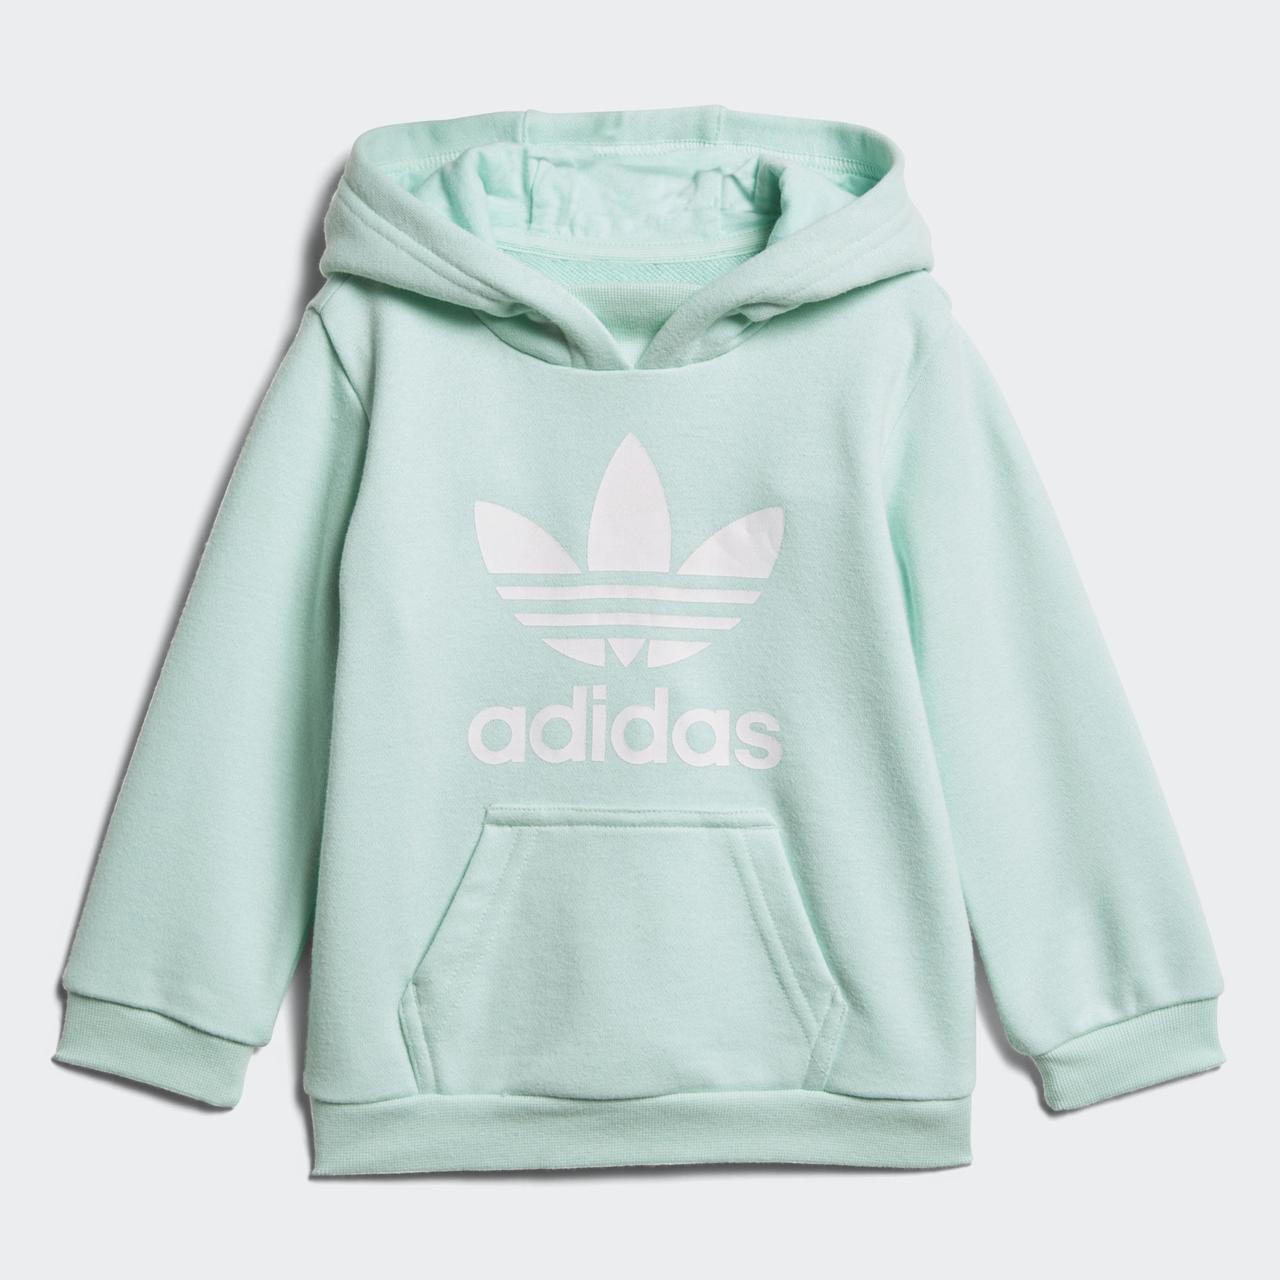 6b2c8b16e2f6dc Детский костюм Adidas Originals Trefoil (Артикул: D96068) -  Интернет-магазин «Эксперт